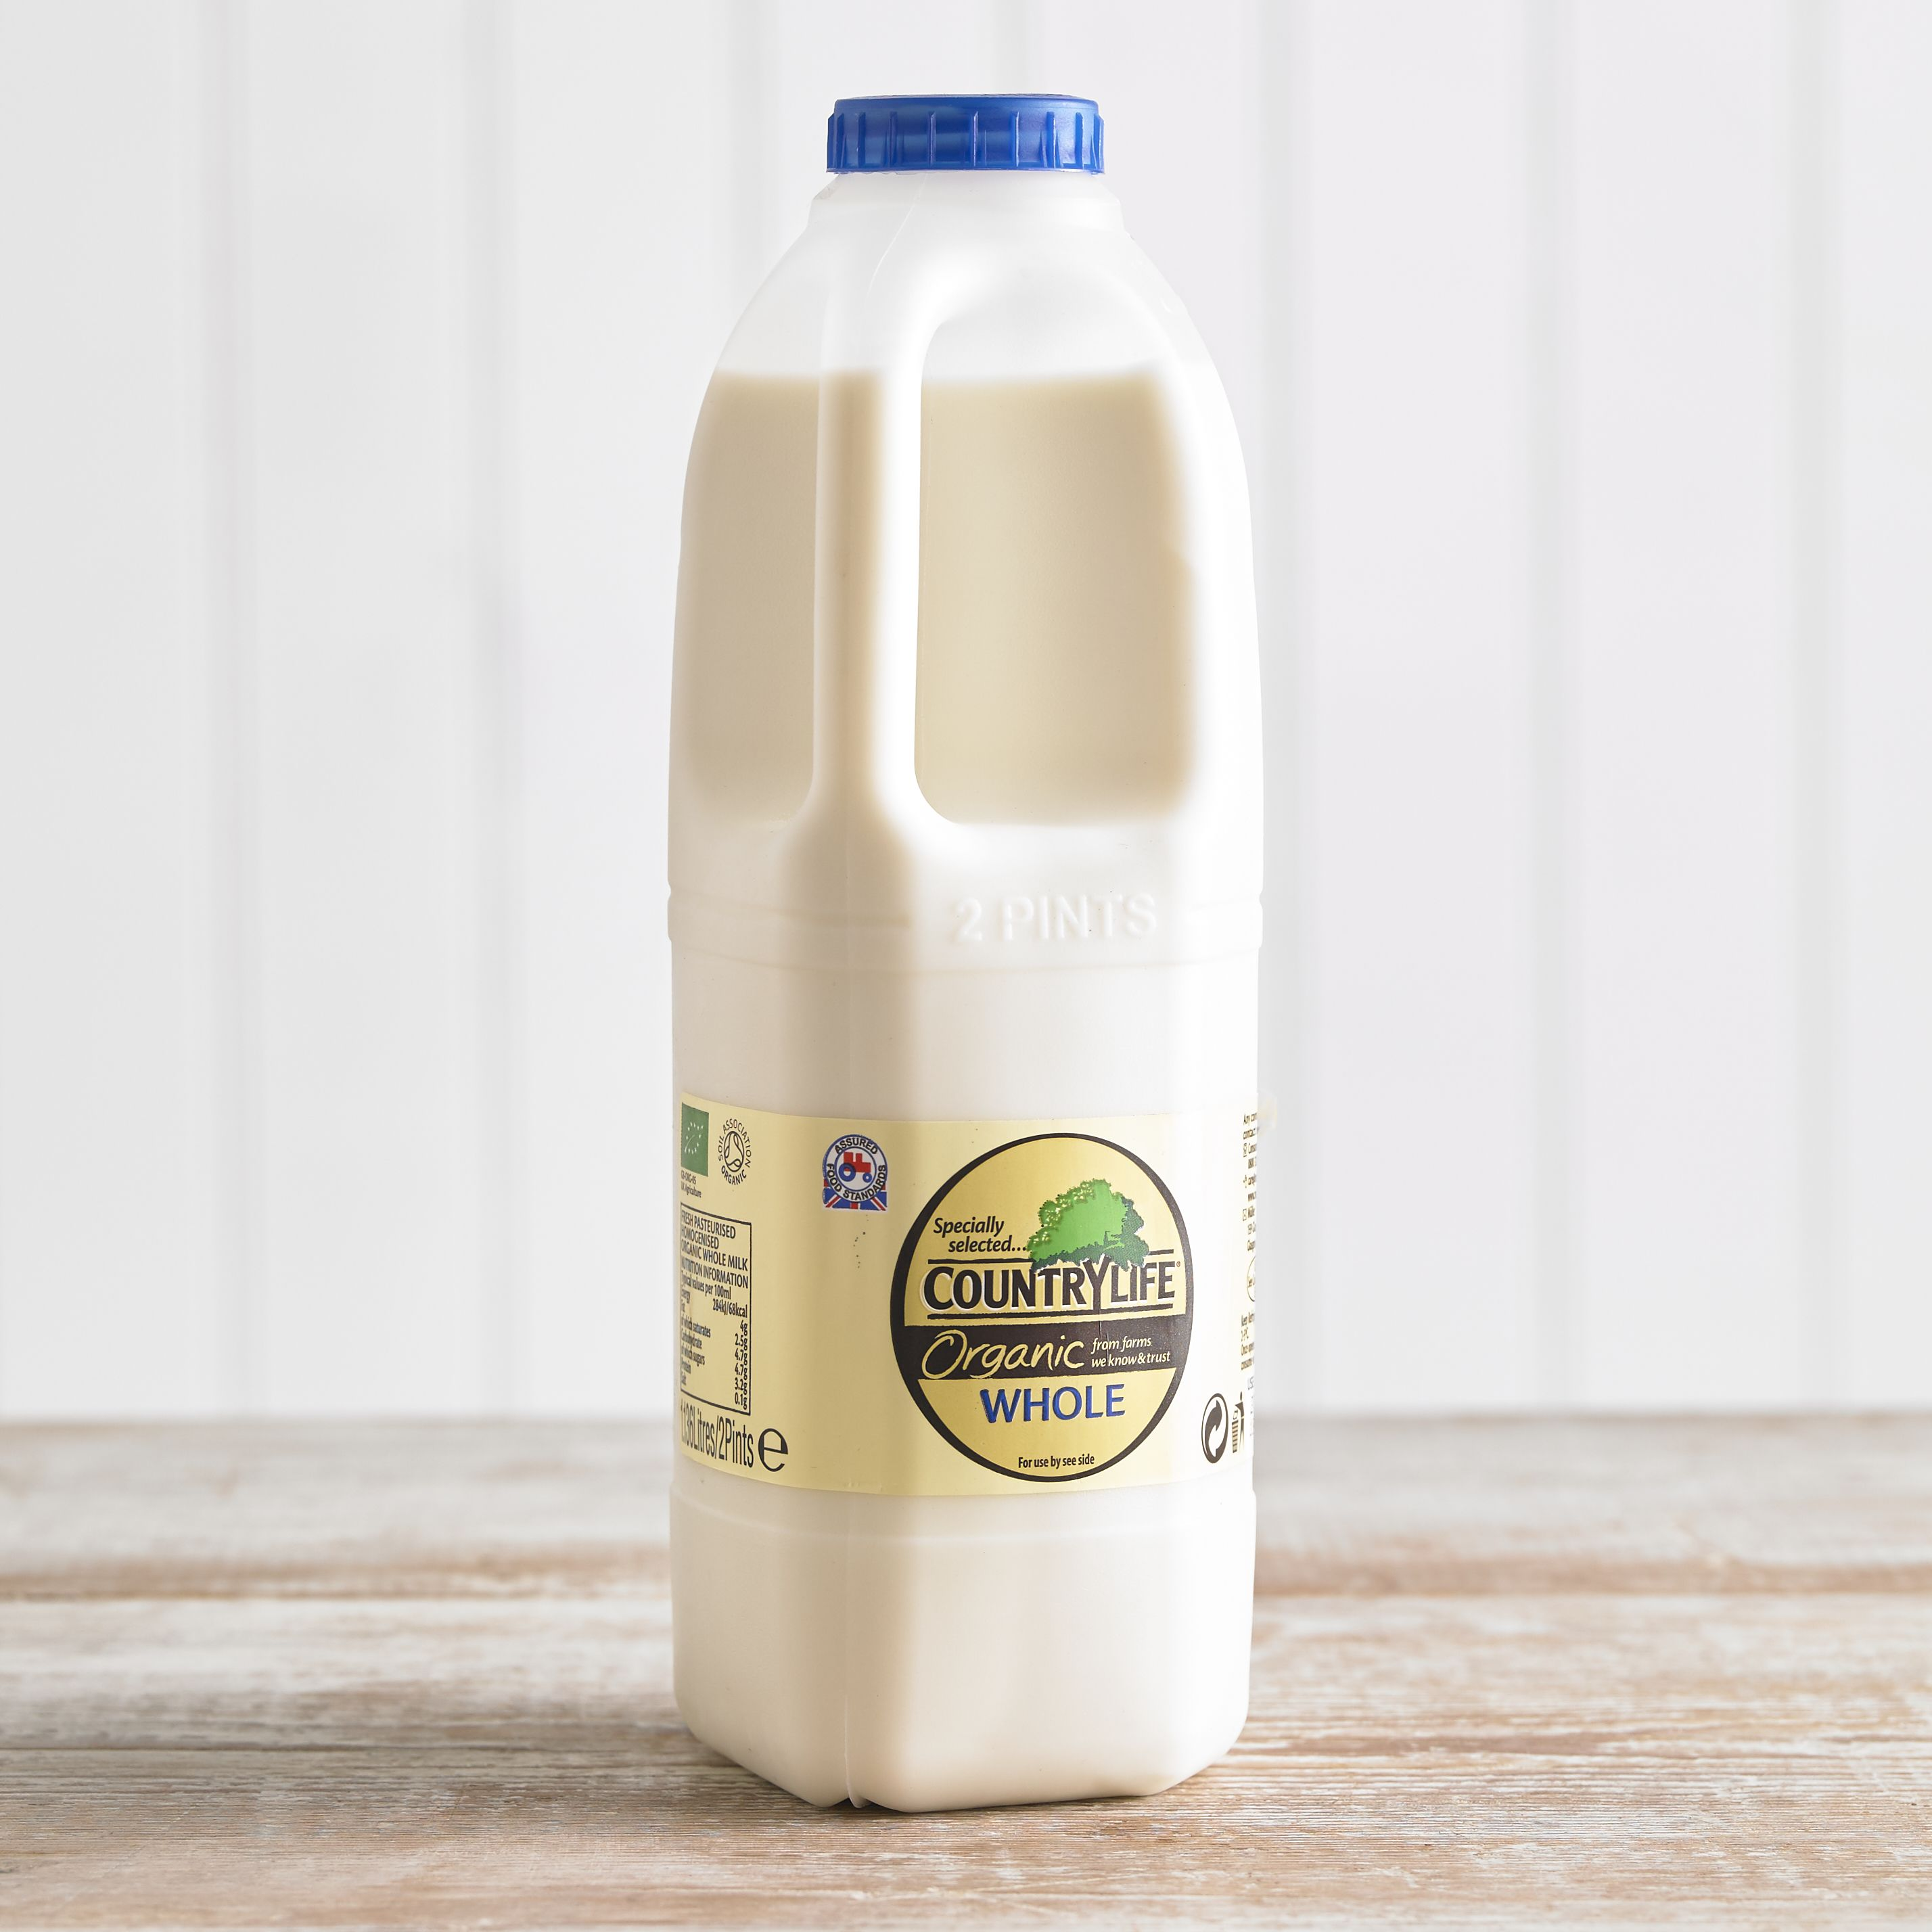 Country Life Organic Whole Milk, 1.136L, 2pt